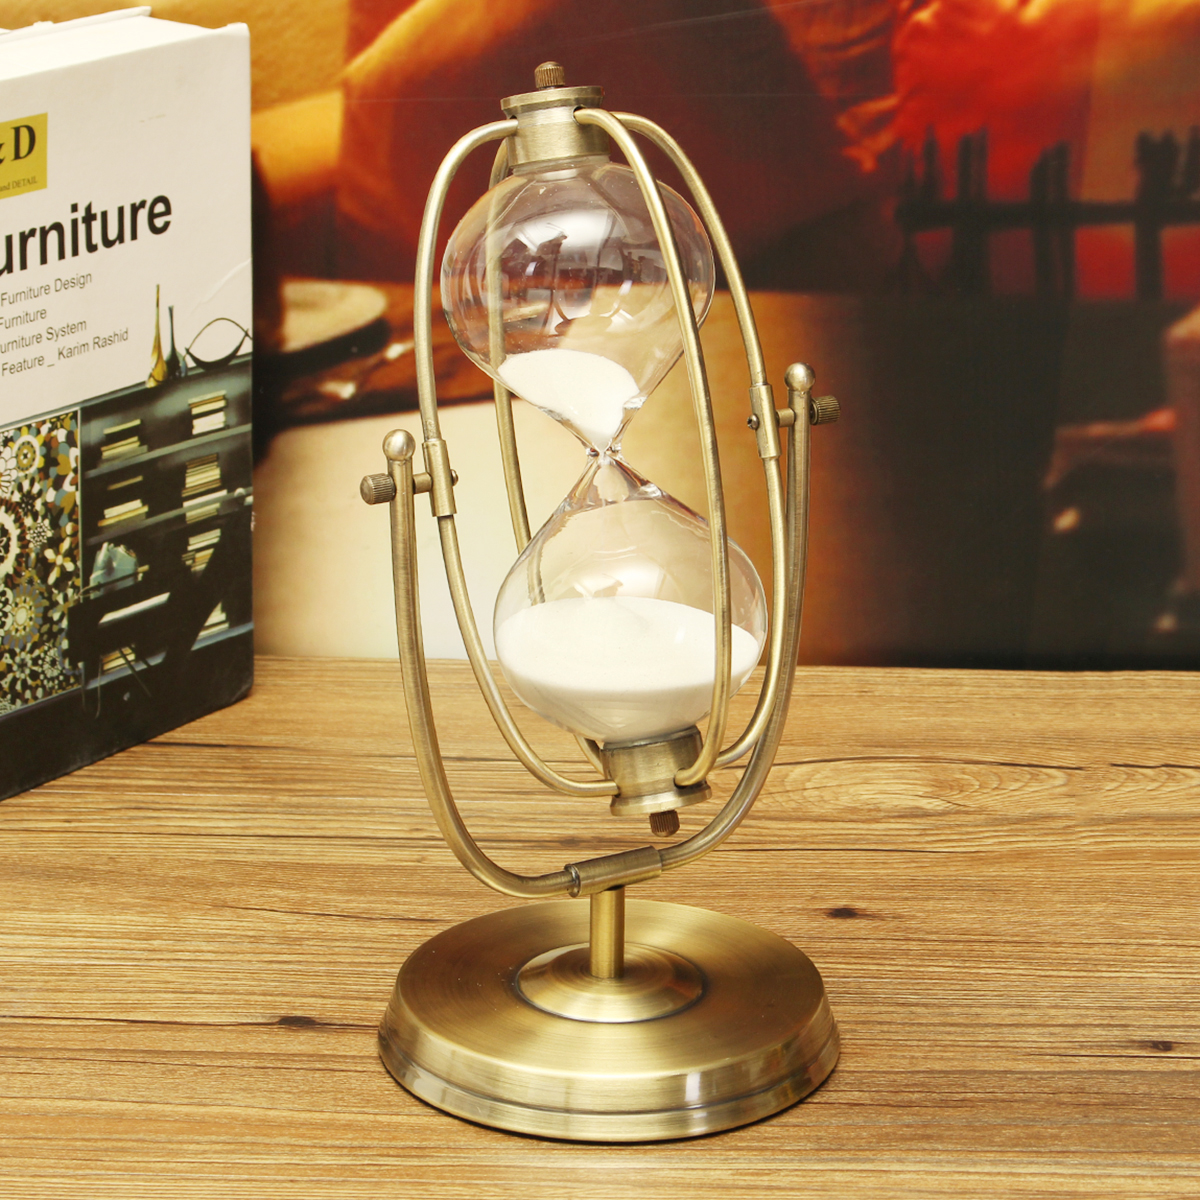 Reloj de arena de 30 minutos reloj de arena de madera Vintage reloj de arena de cristal de reloj de arena temporizadores de té decoración del hogar regalo de adorno de oficina